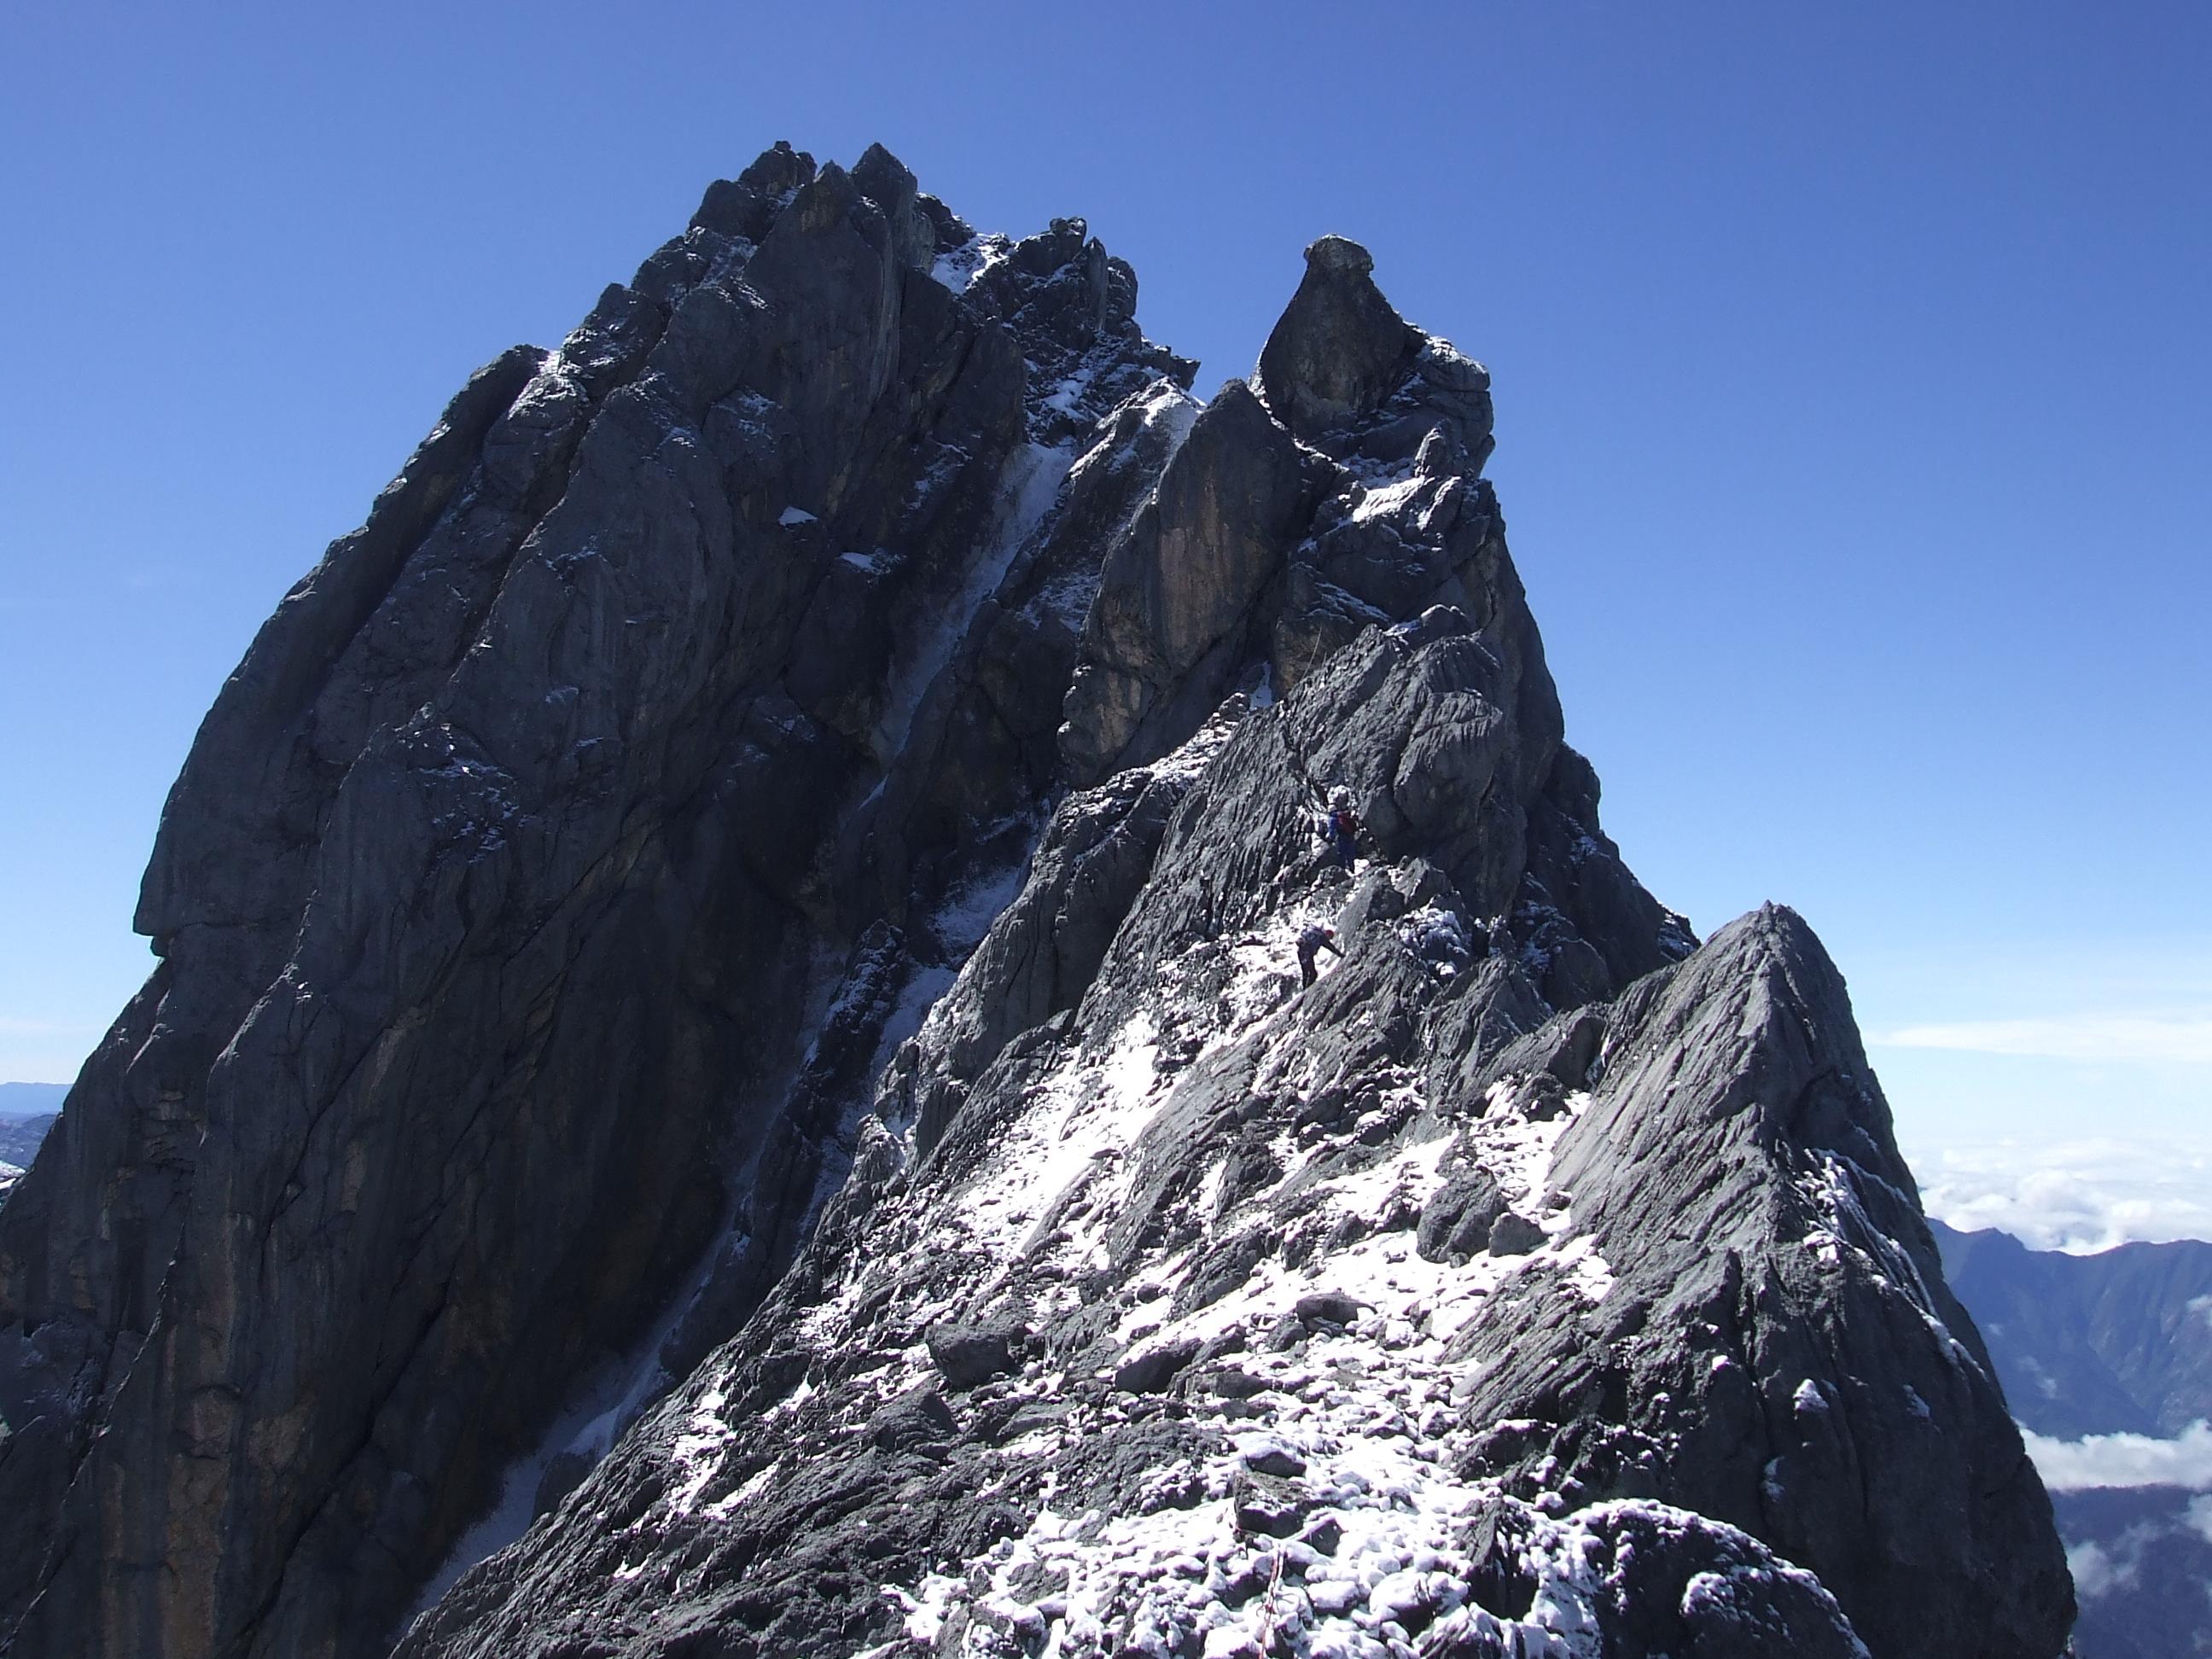 Carstensz Pyramid(4884m) mászás Indonézia, Nyugat -Guinea #a6095dfe-82b9-45fc-8238-509d310ceb36